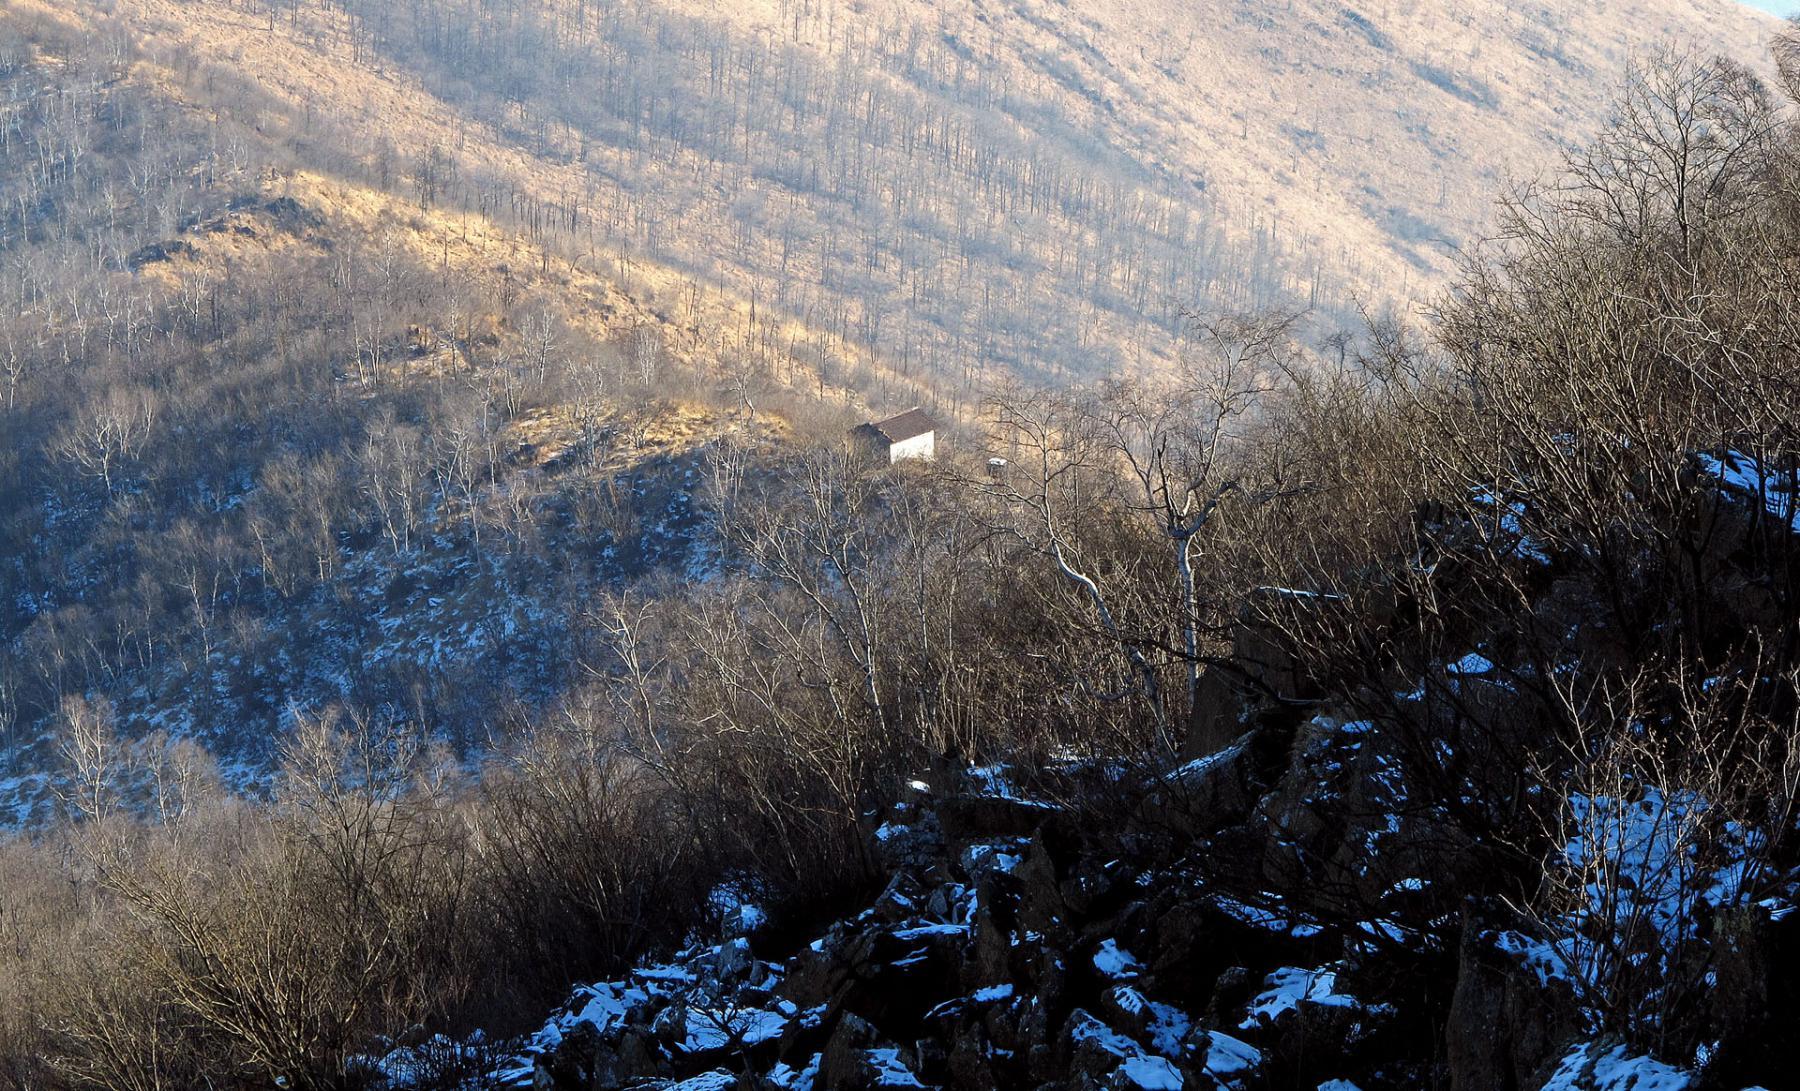 La Madonna della Neve vista dal M. Lera